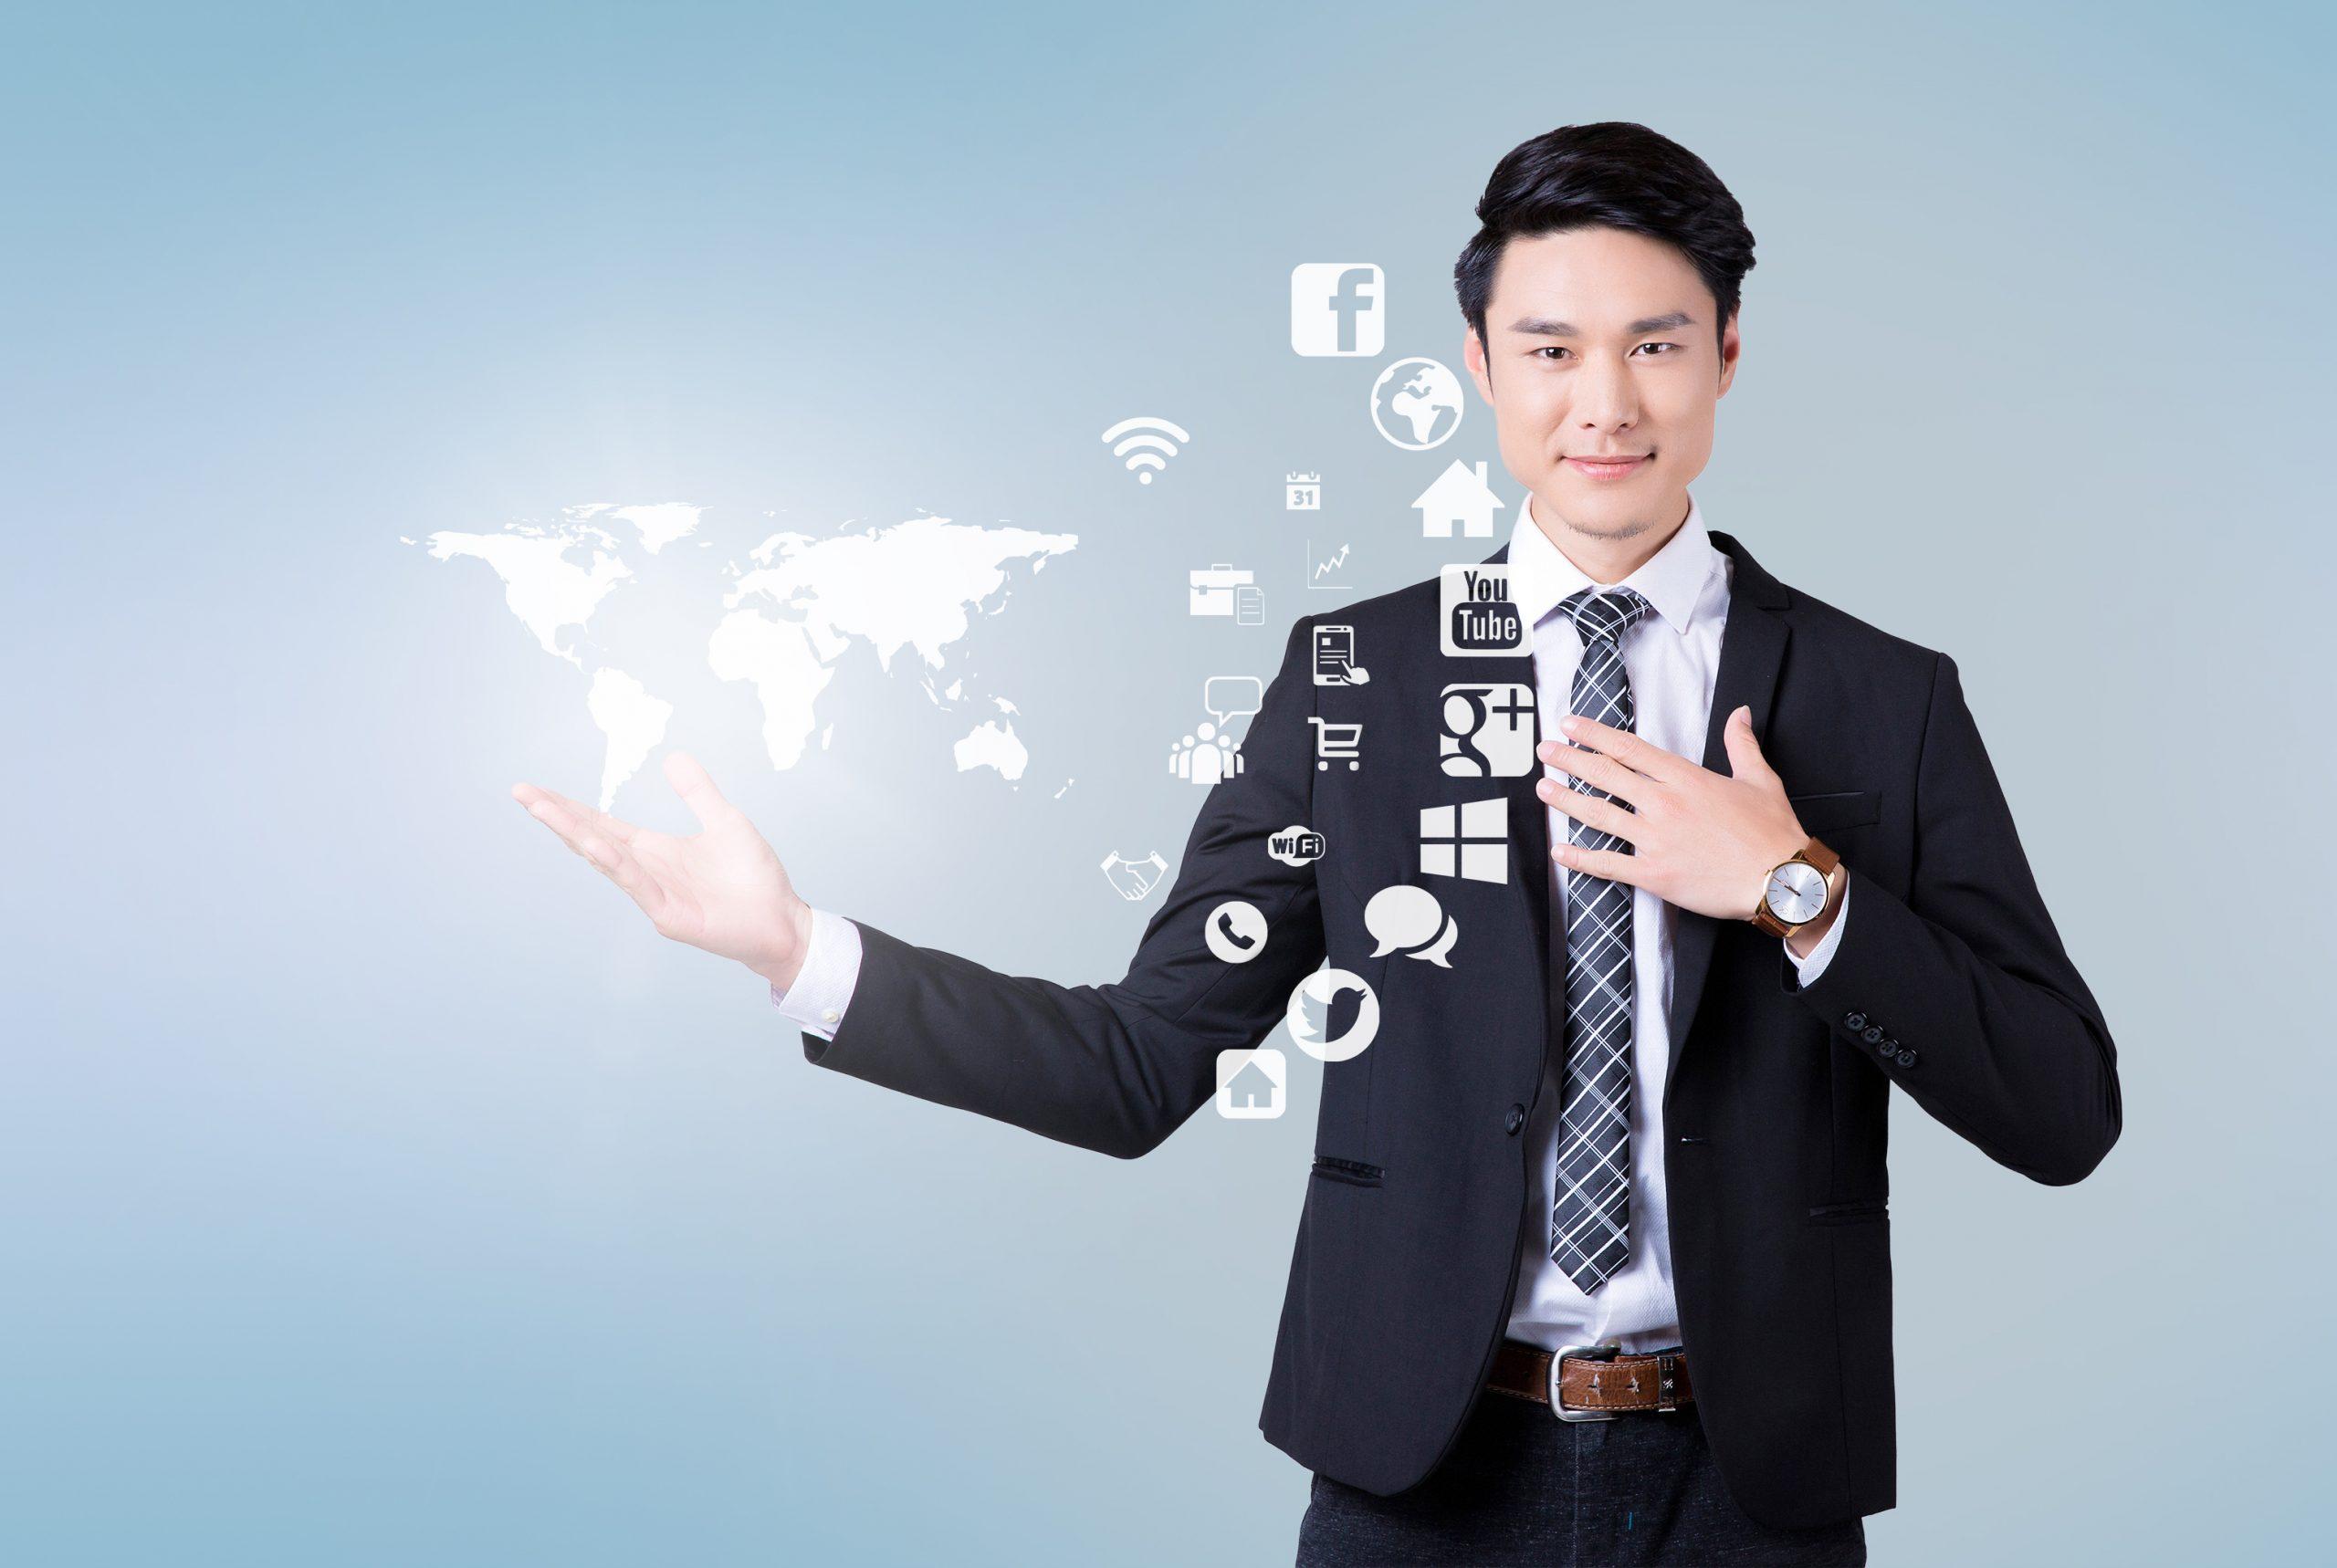 Lovepik_com-500610025-business-internet-information